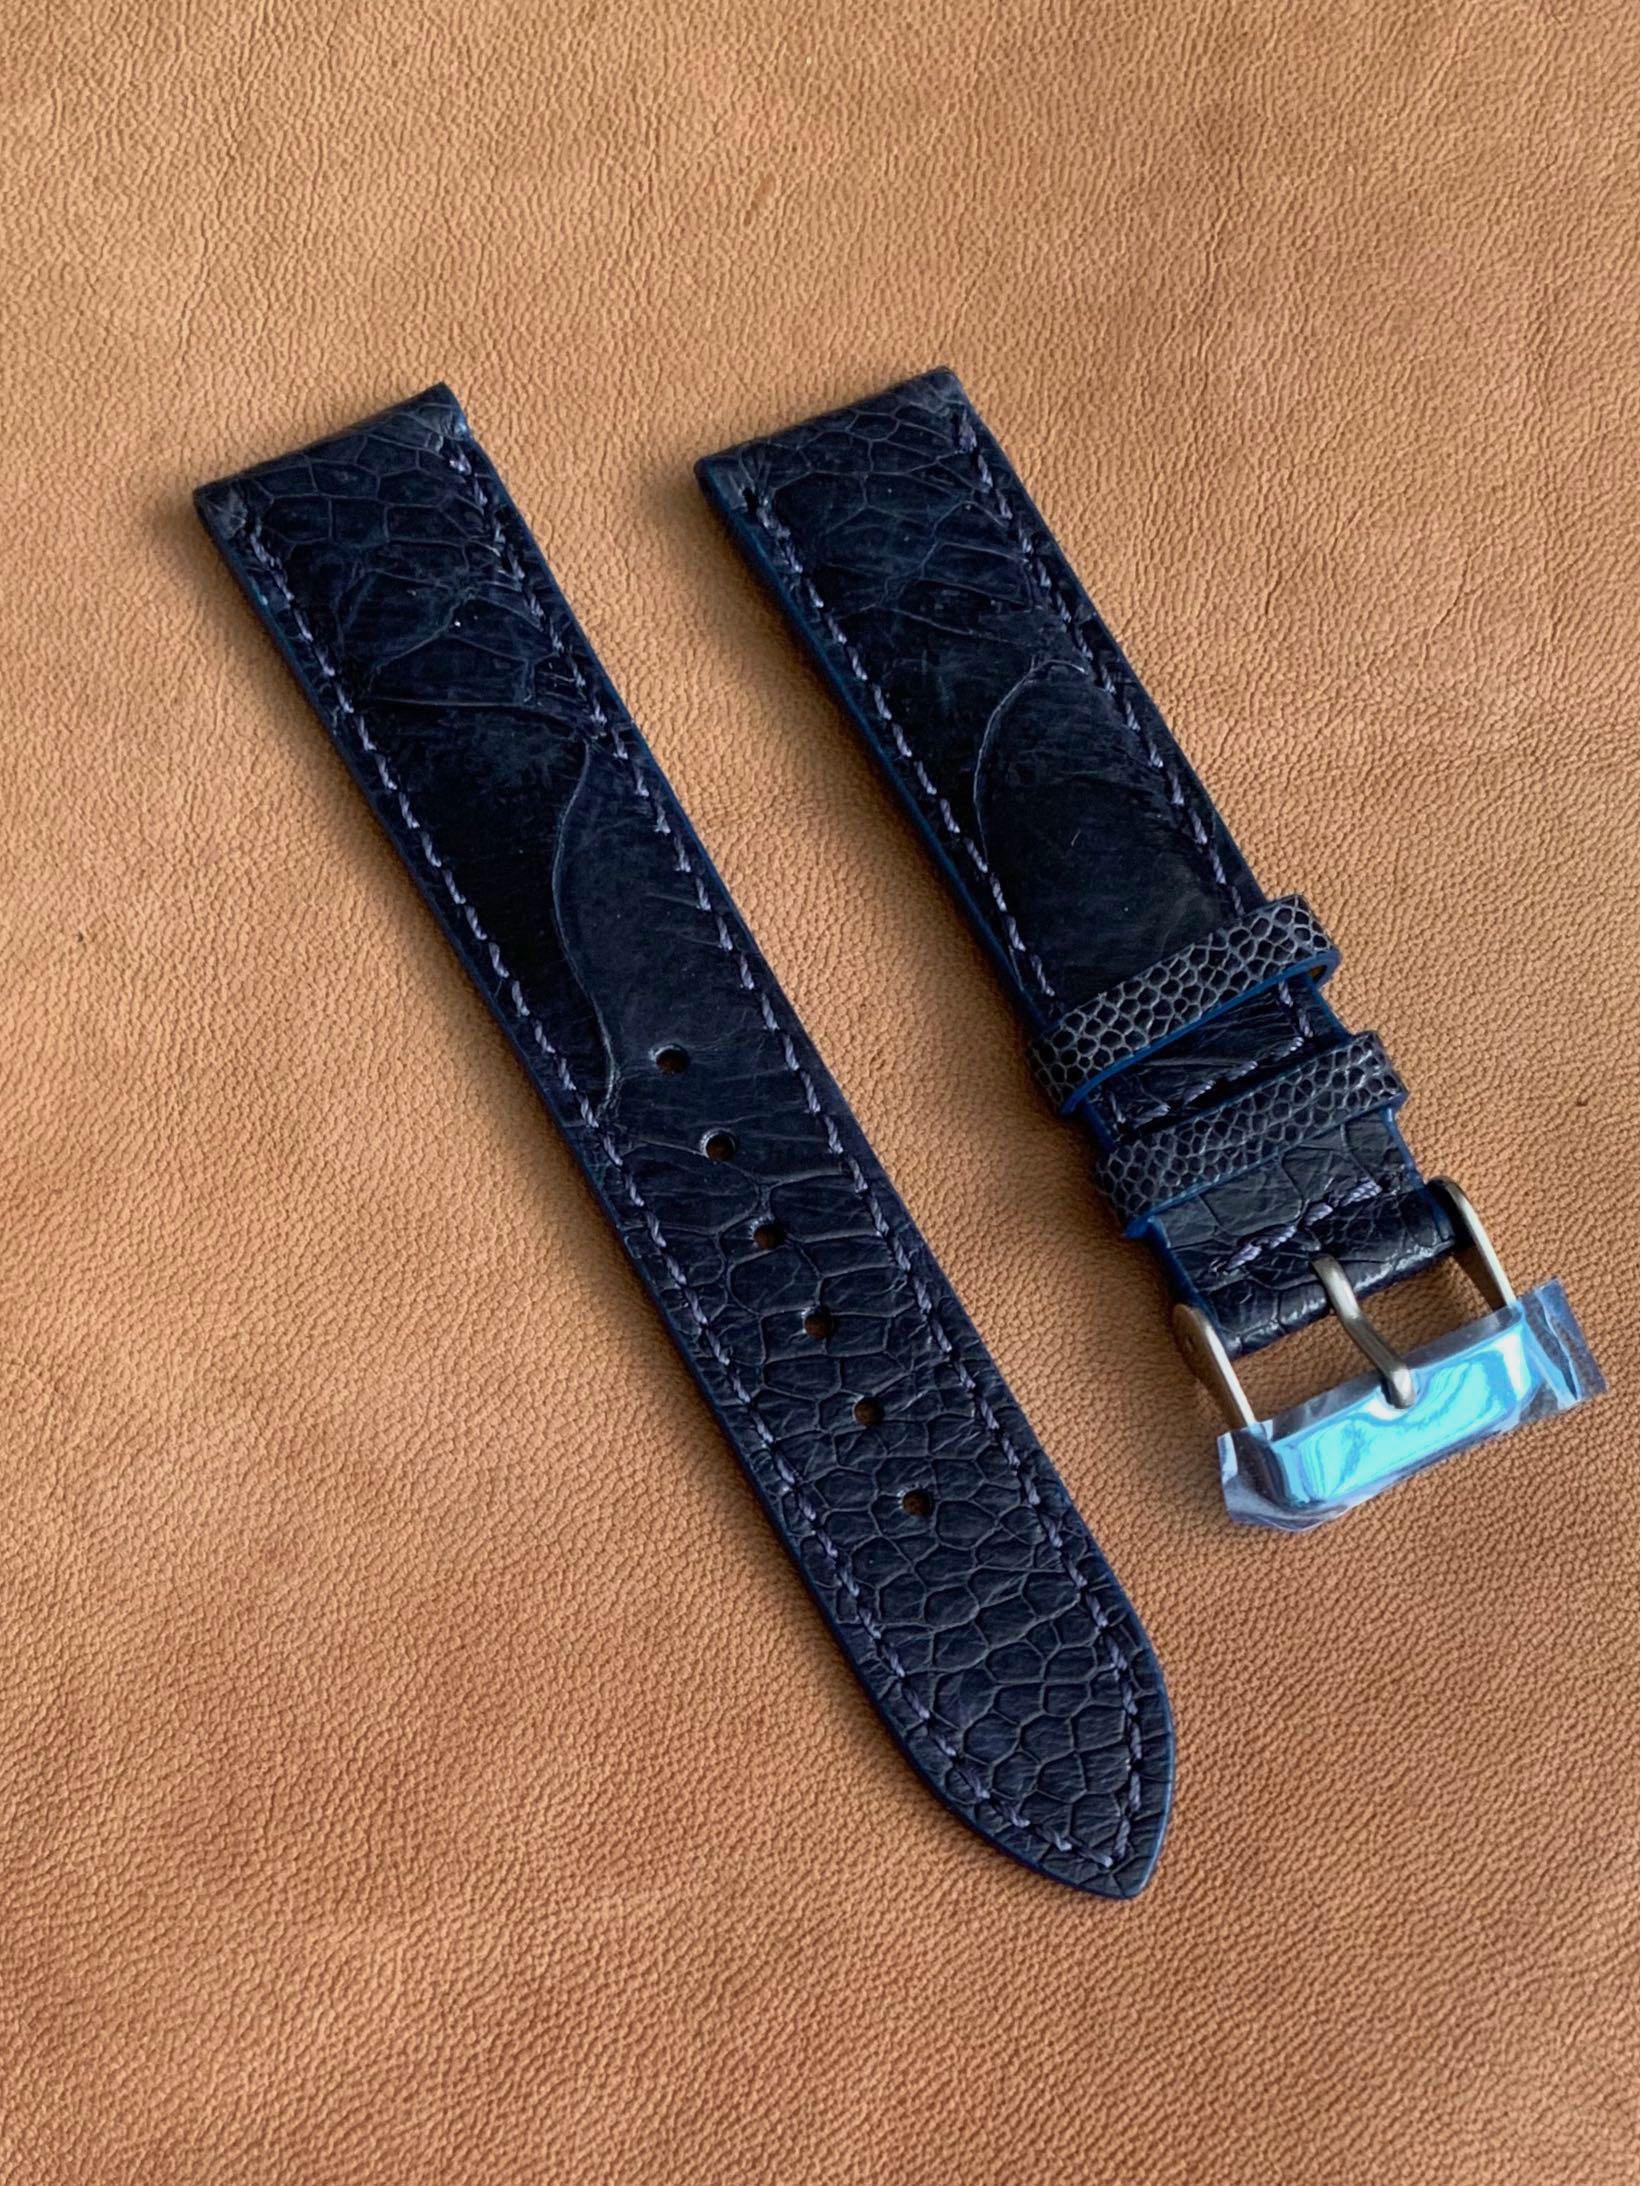 20mm/18mm Dark Blue Ostrich Leg Watch Strap (big scales and with stitching ) - 20mm@lug/18mm@buckle  20mm/18mm (LAST PIECE! 😊- one already sold! 👍🏻)